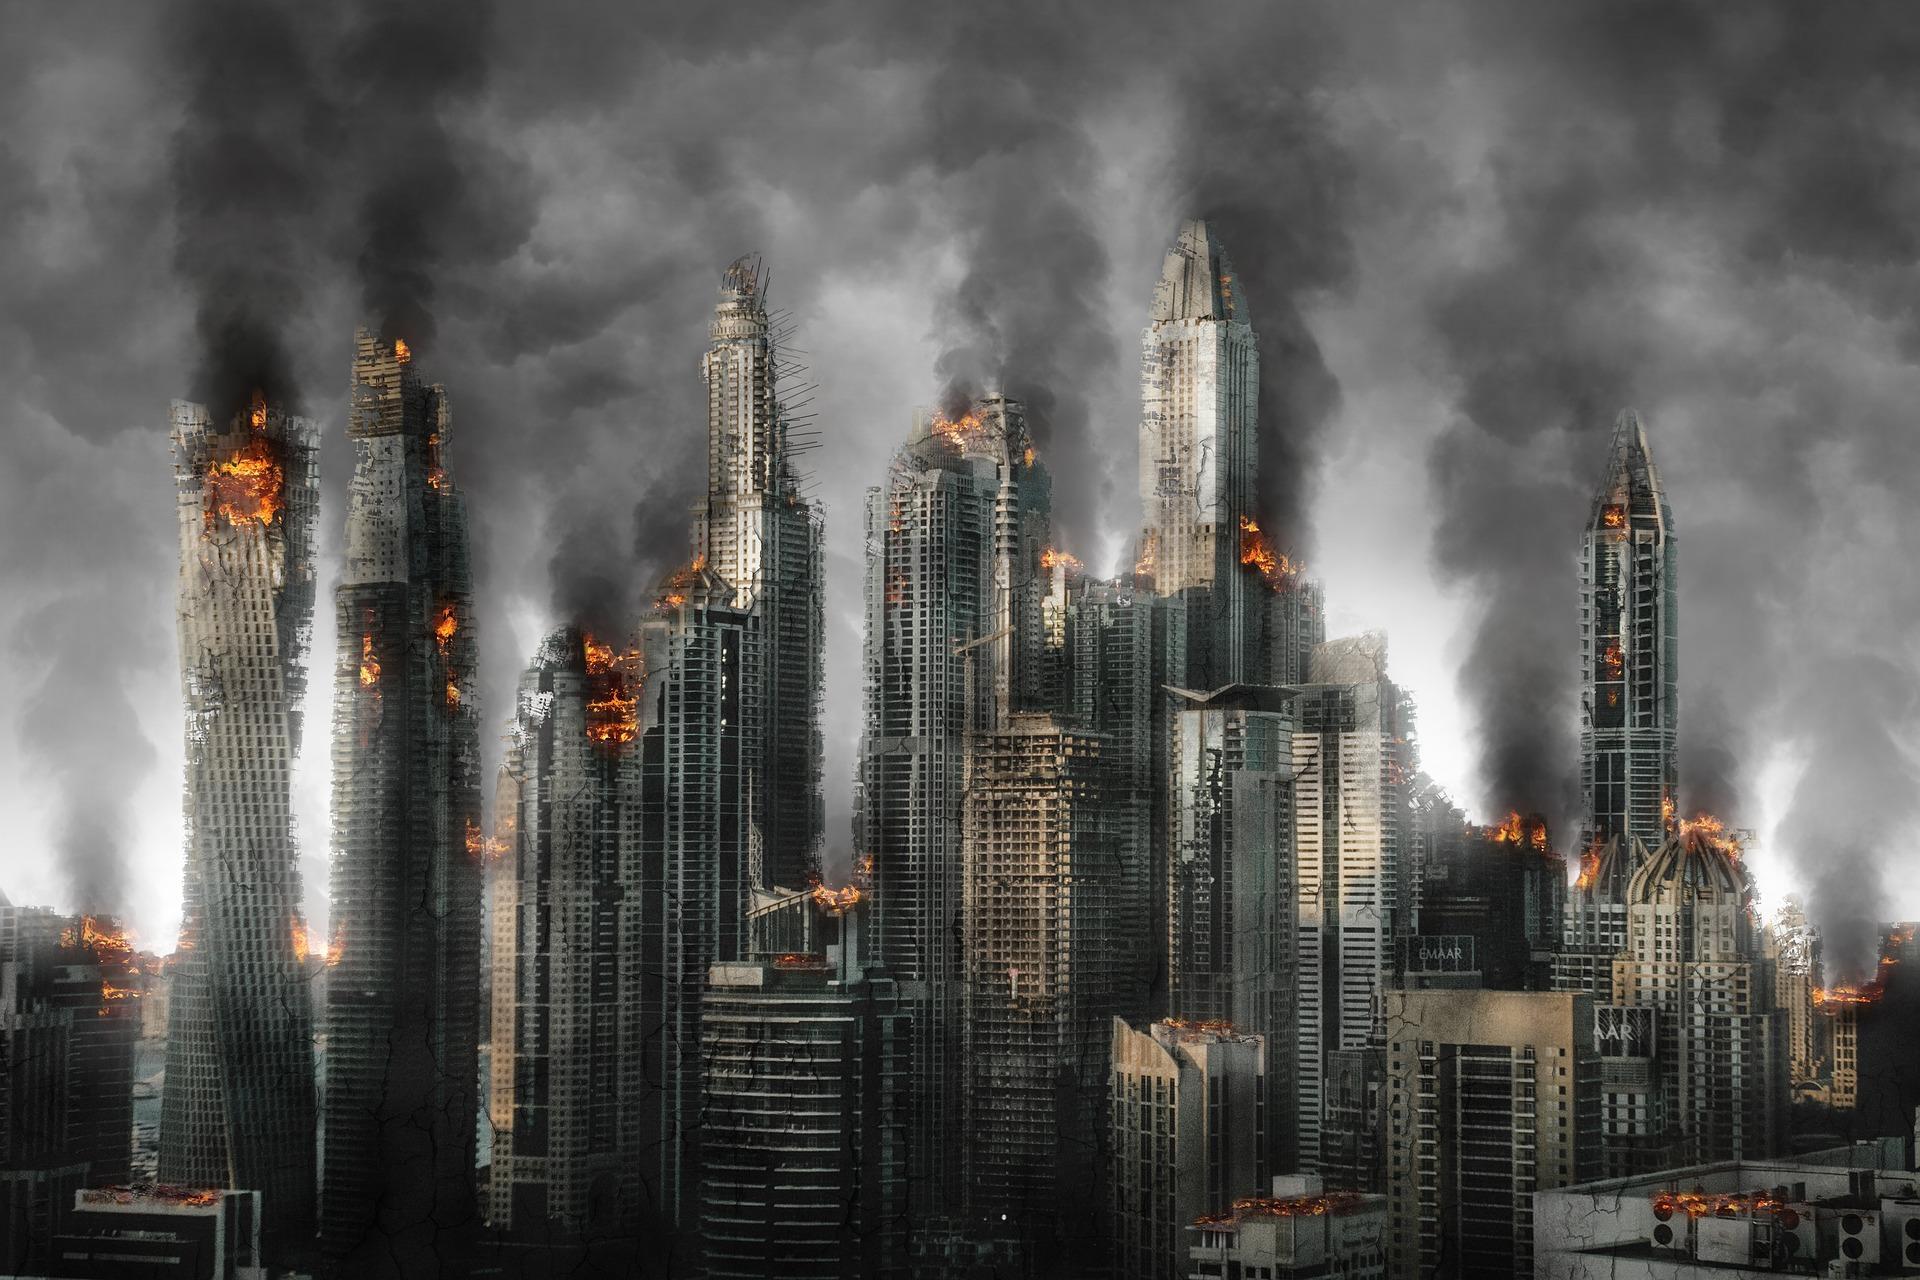 armageddon 2721568 1920 - Apokalypsa, datum apokalypsy